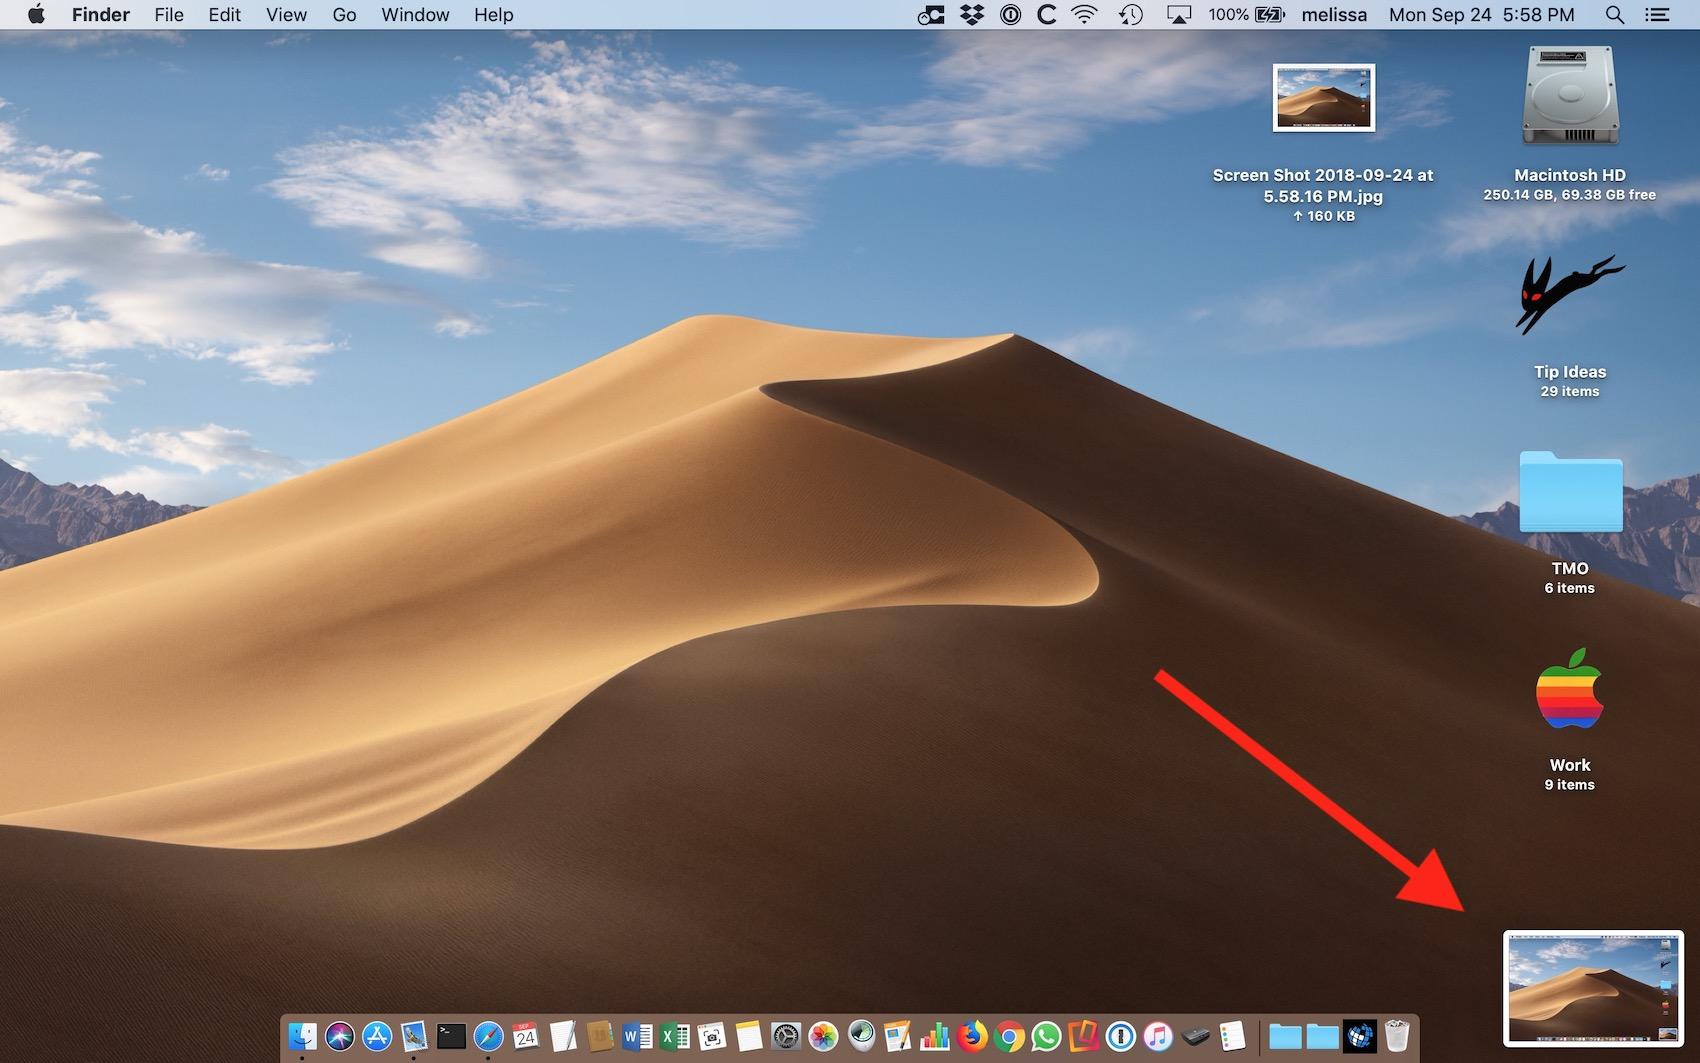 Thumbnail of Screenshot in macOS Mojave